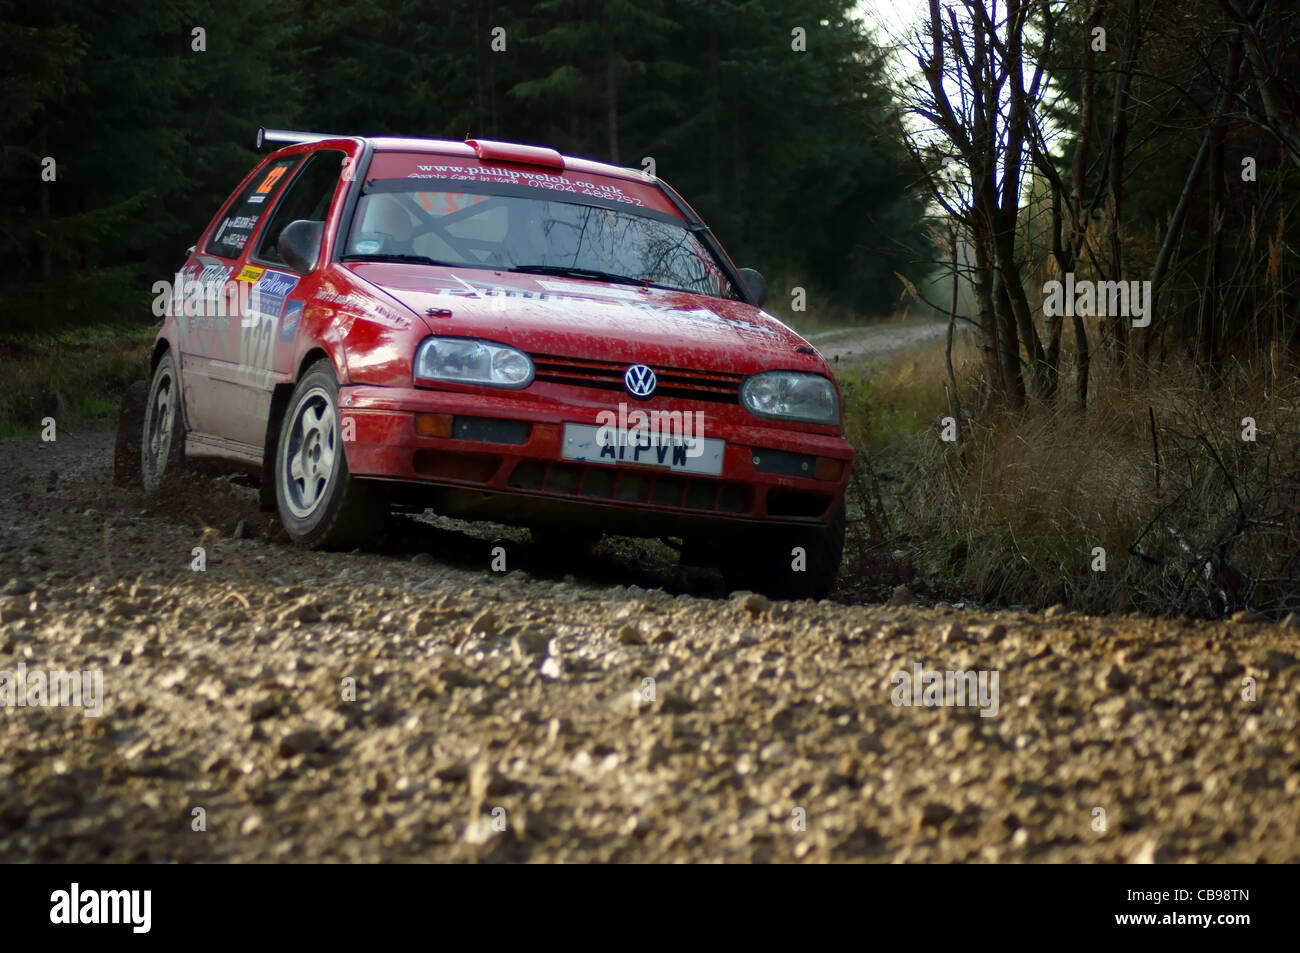 VW Golf Kit Rally Car - Stock Image